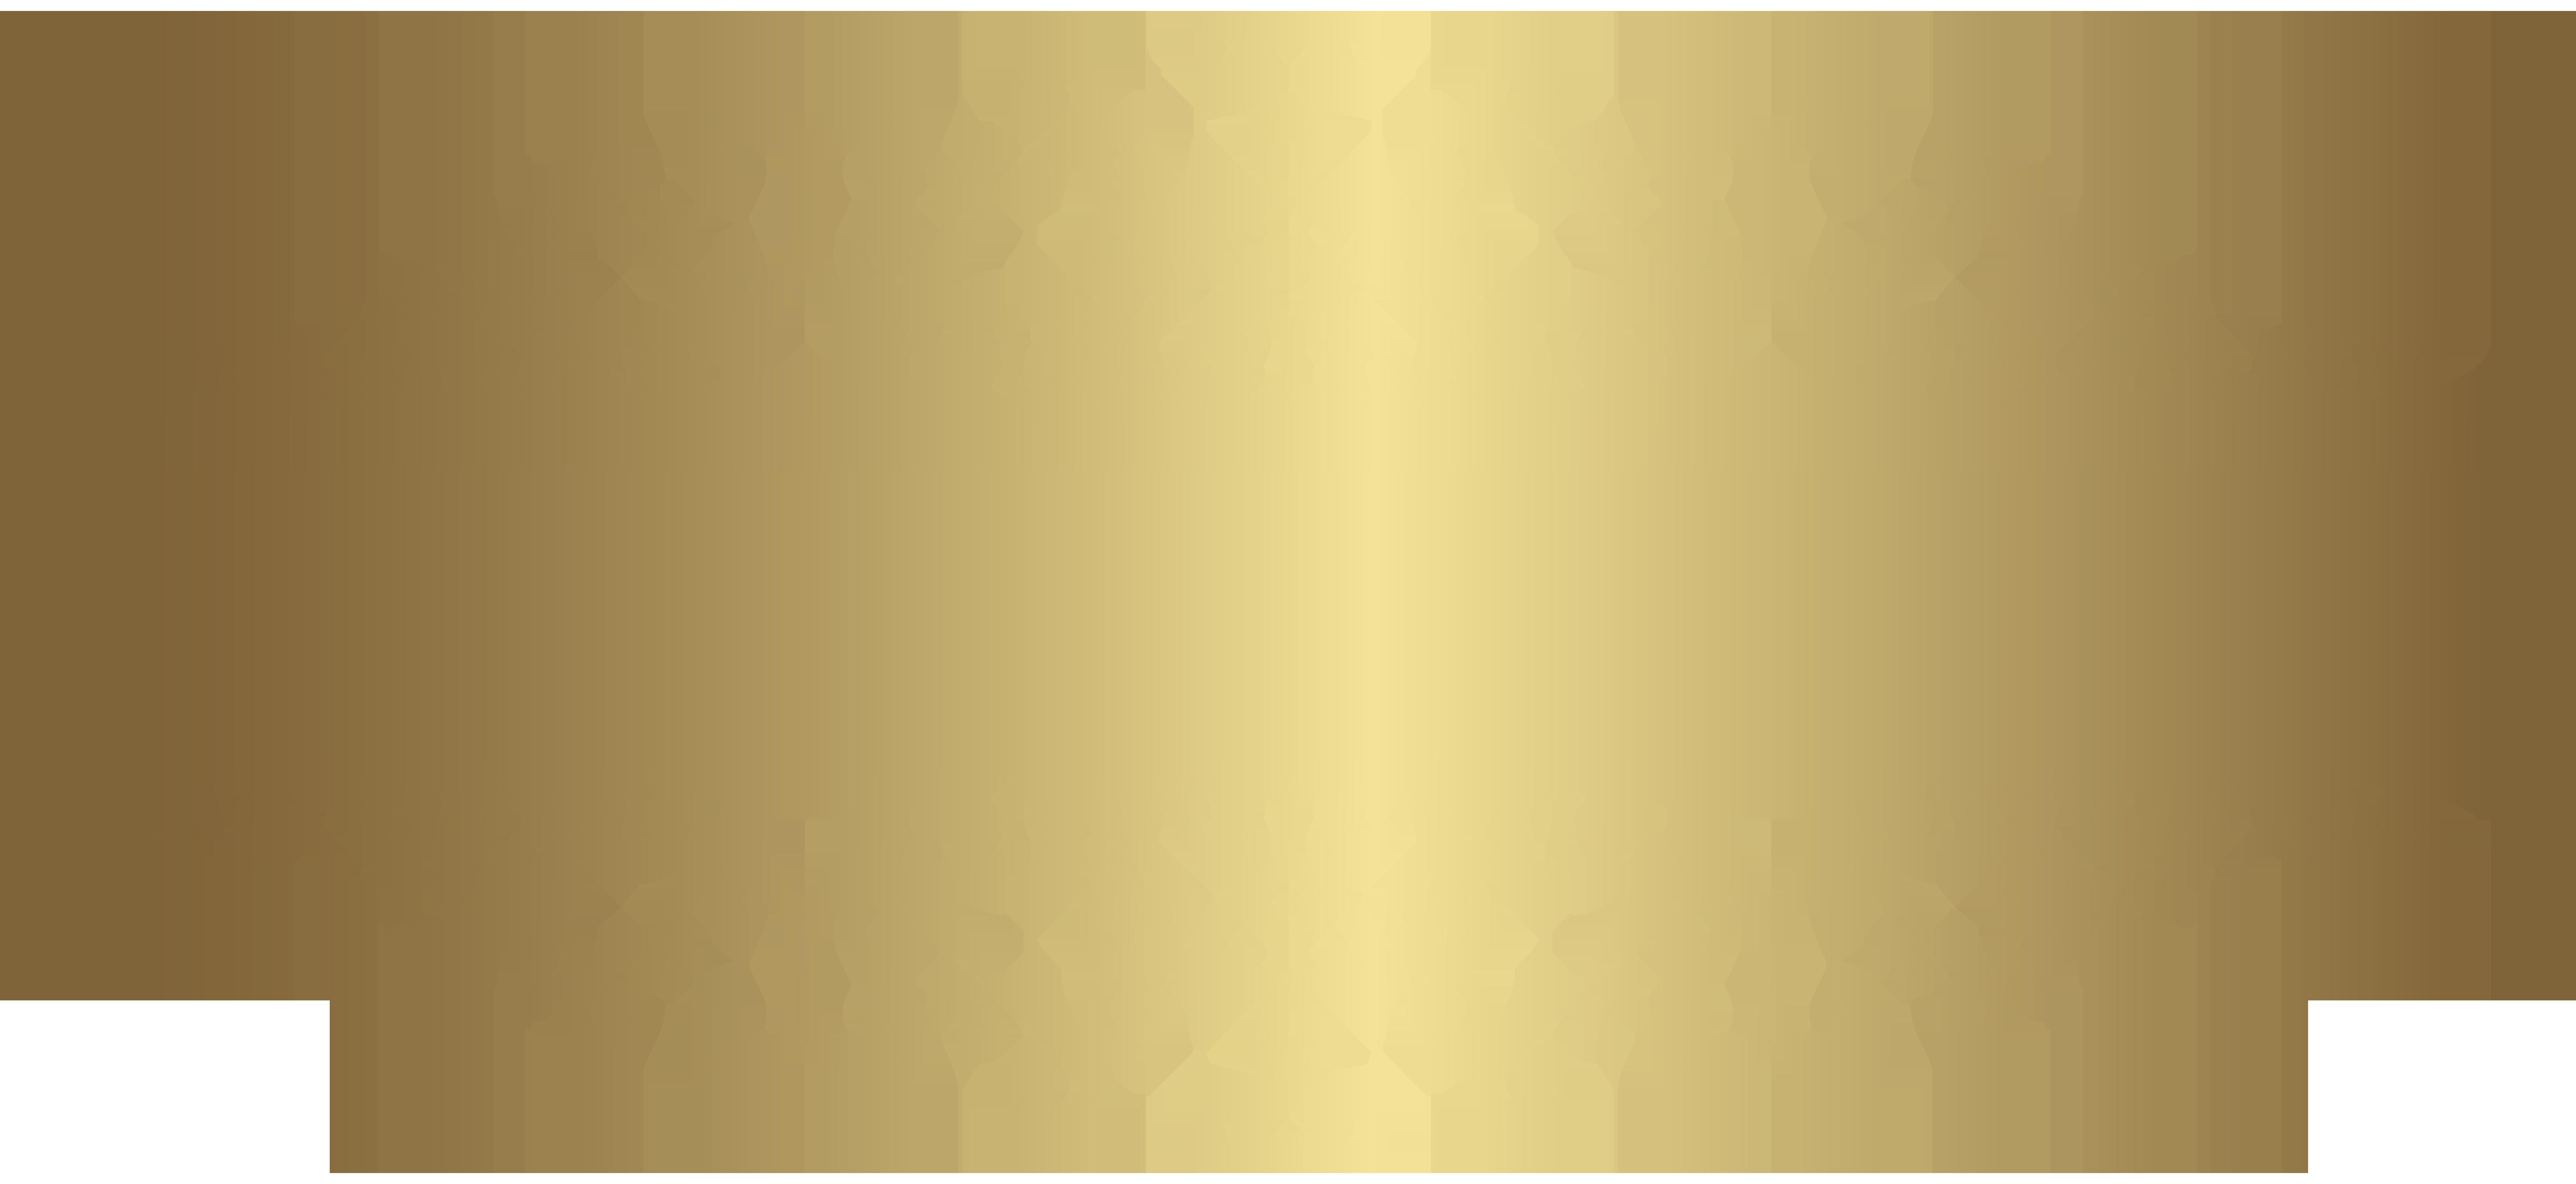 Gold decorative element png. Clipart shapes ornamental